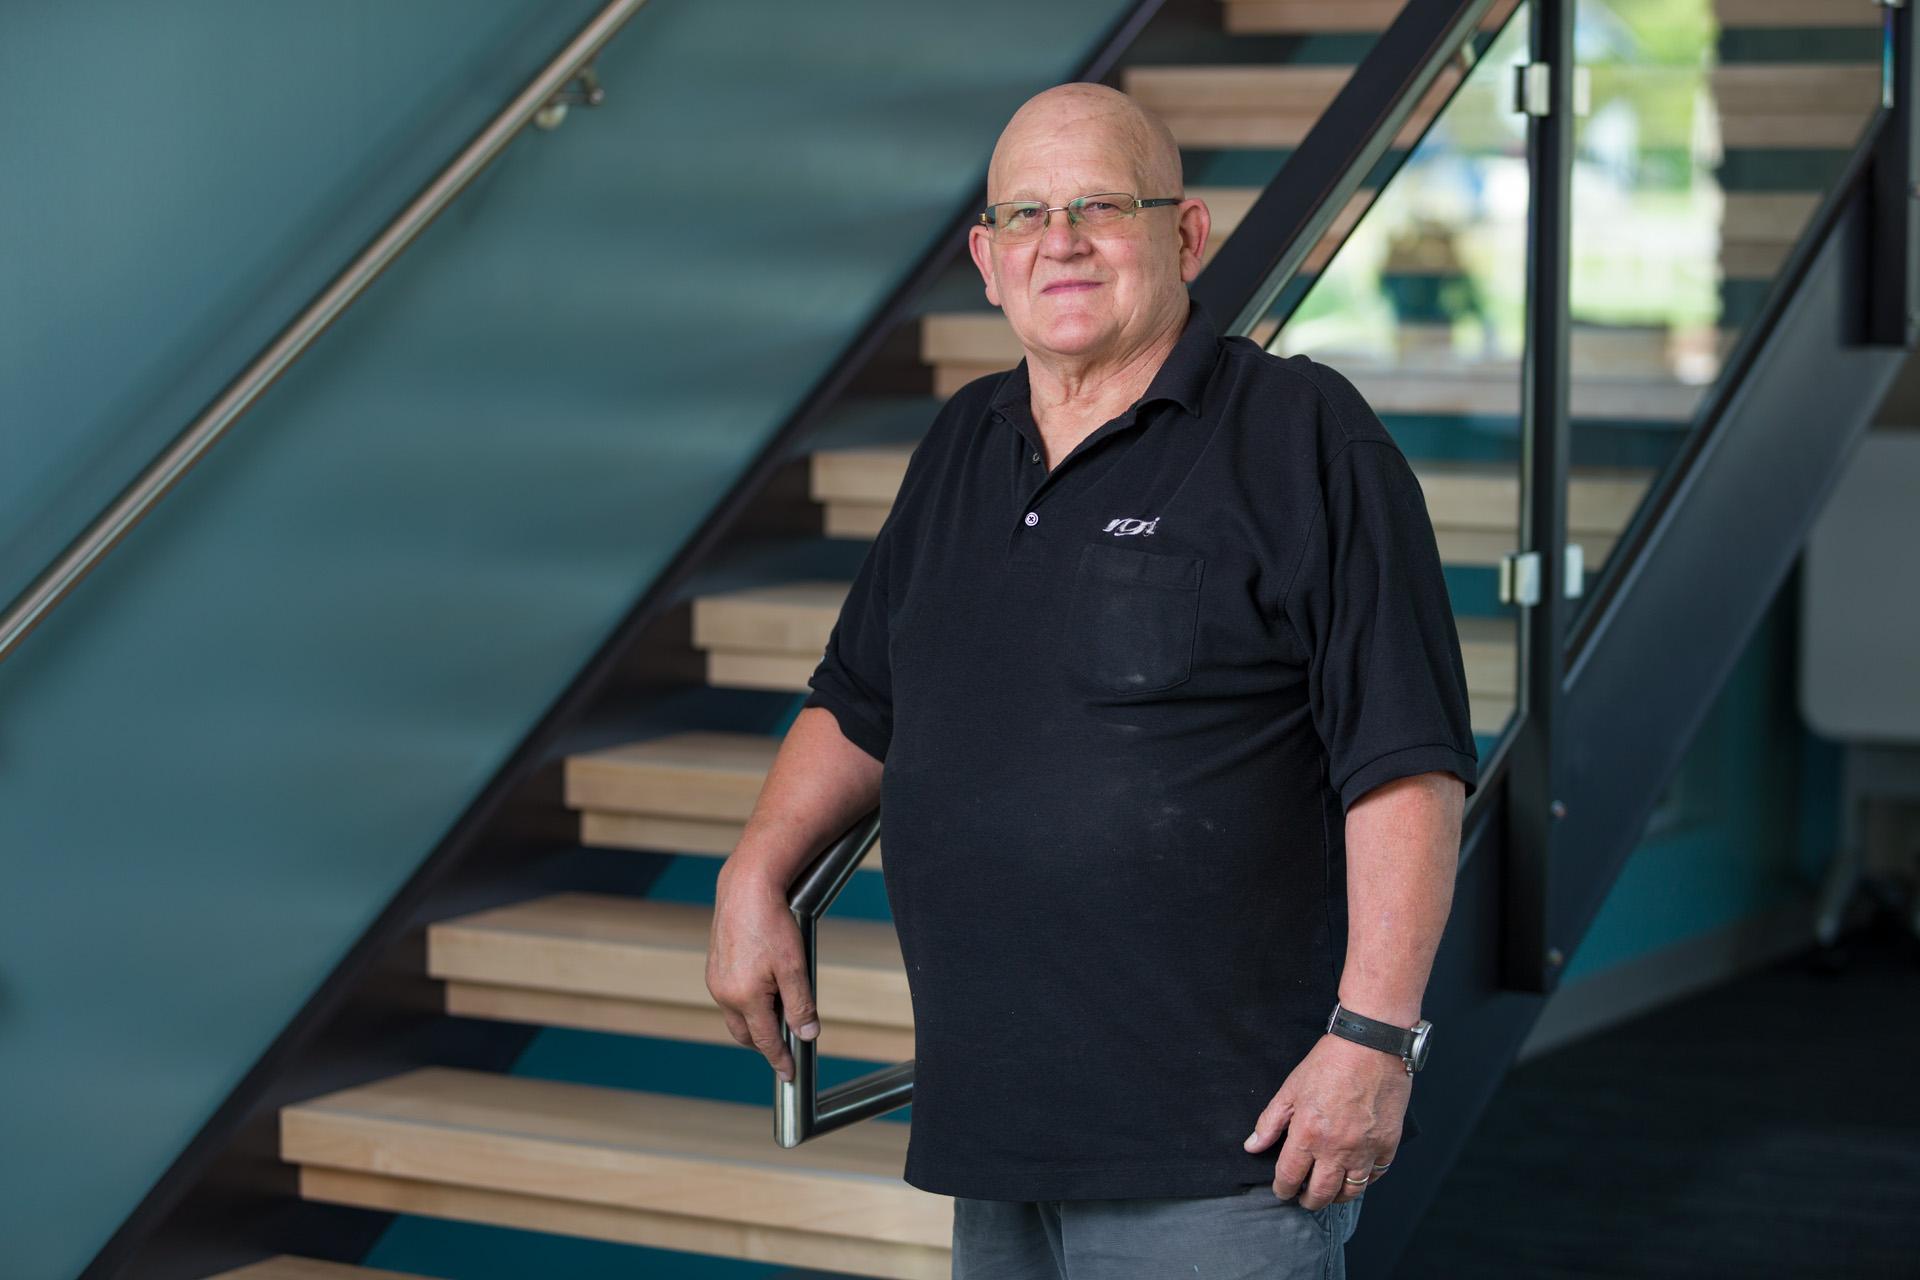 Don Gerber, Founder + Principal Builder